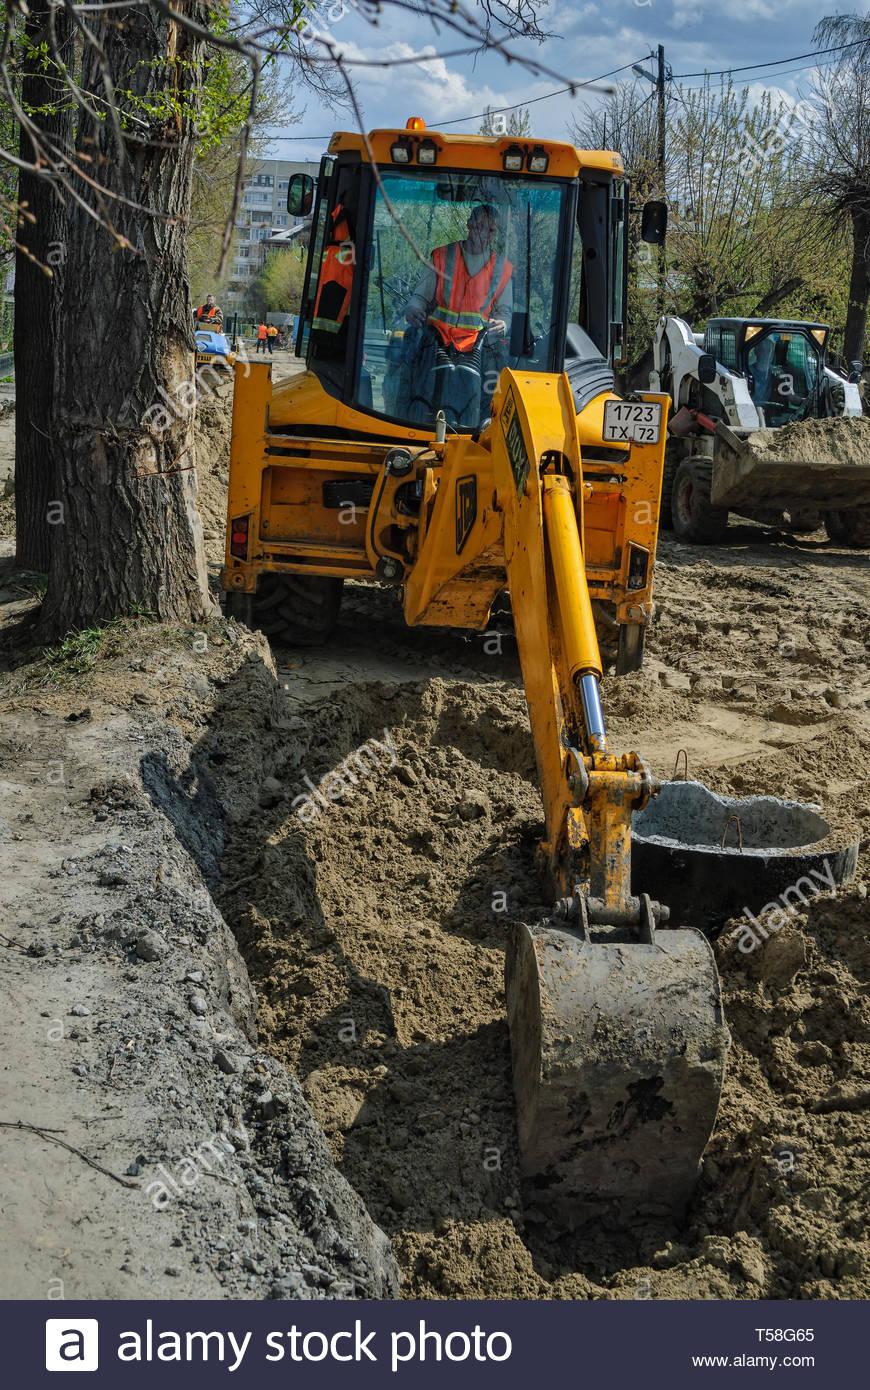 Tyumen, Russia - May 5, 2007: Excavators machine on road construction site - Stock Image